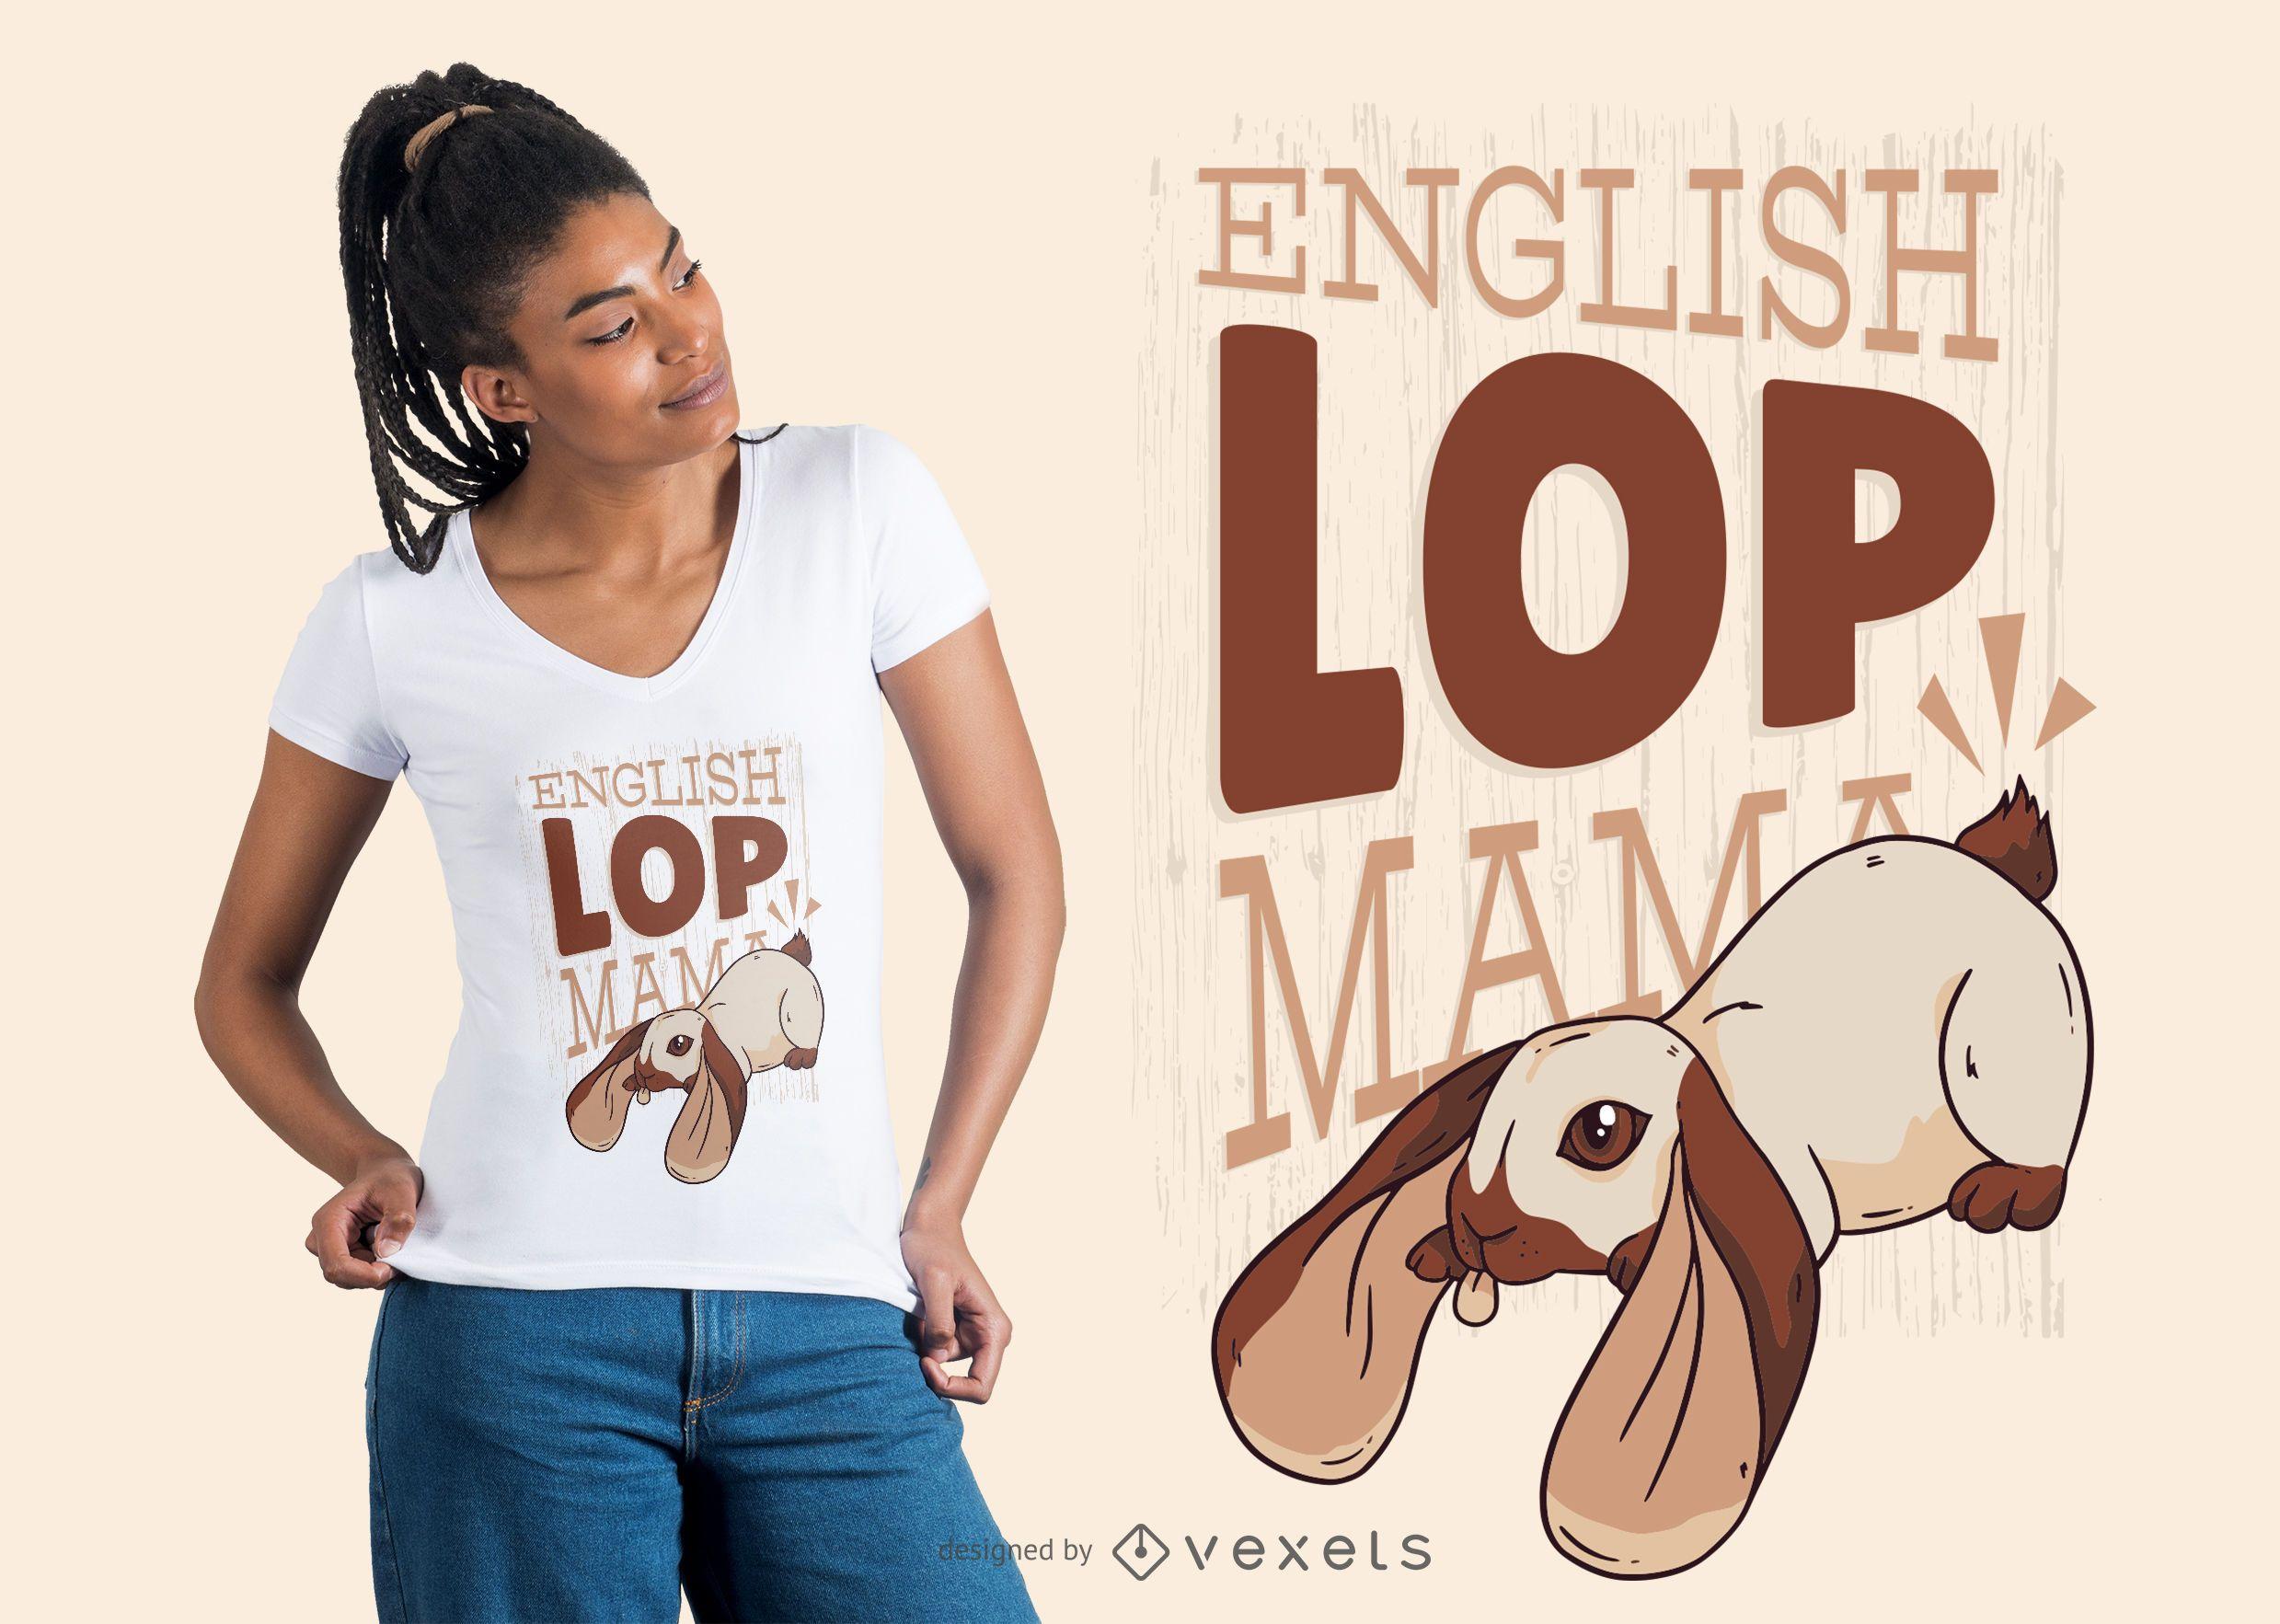 English Lop Mama T-shirt Design